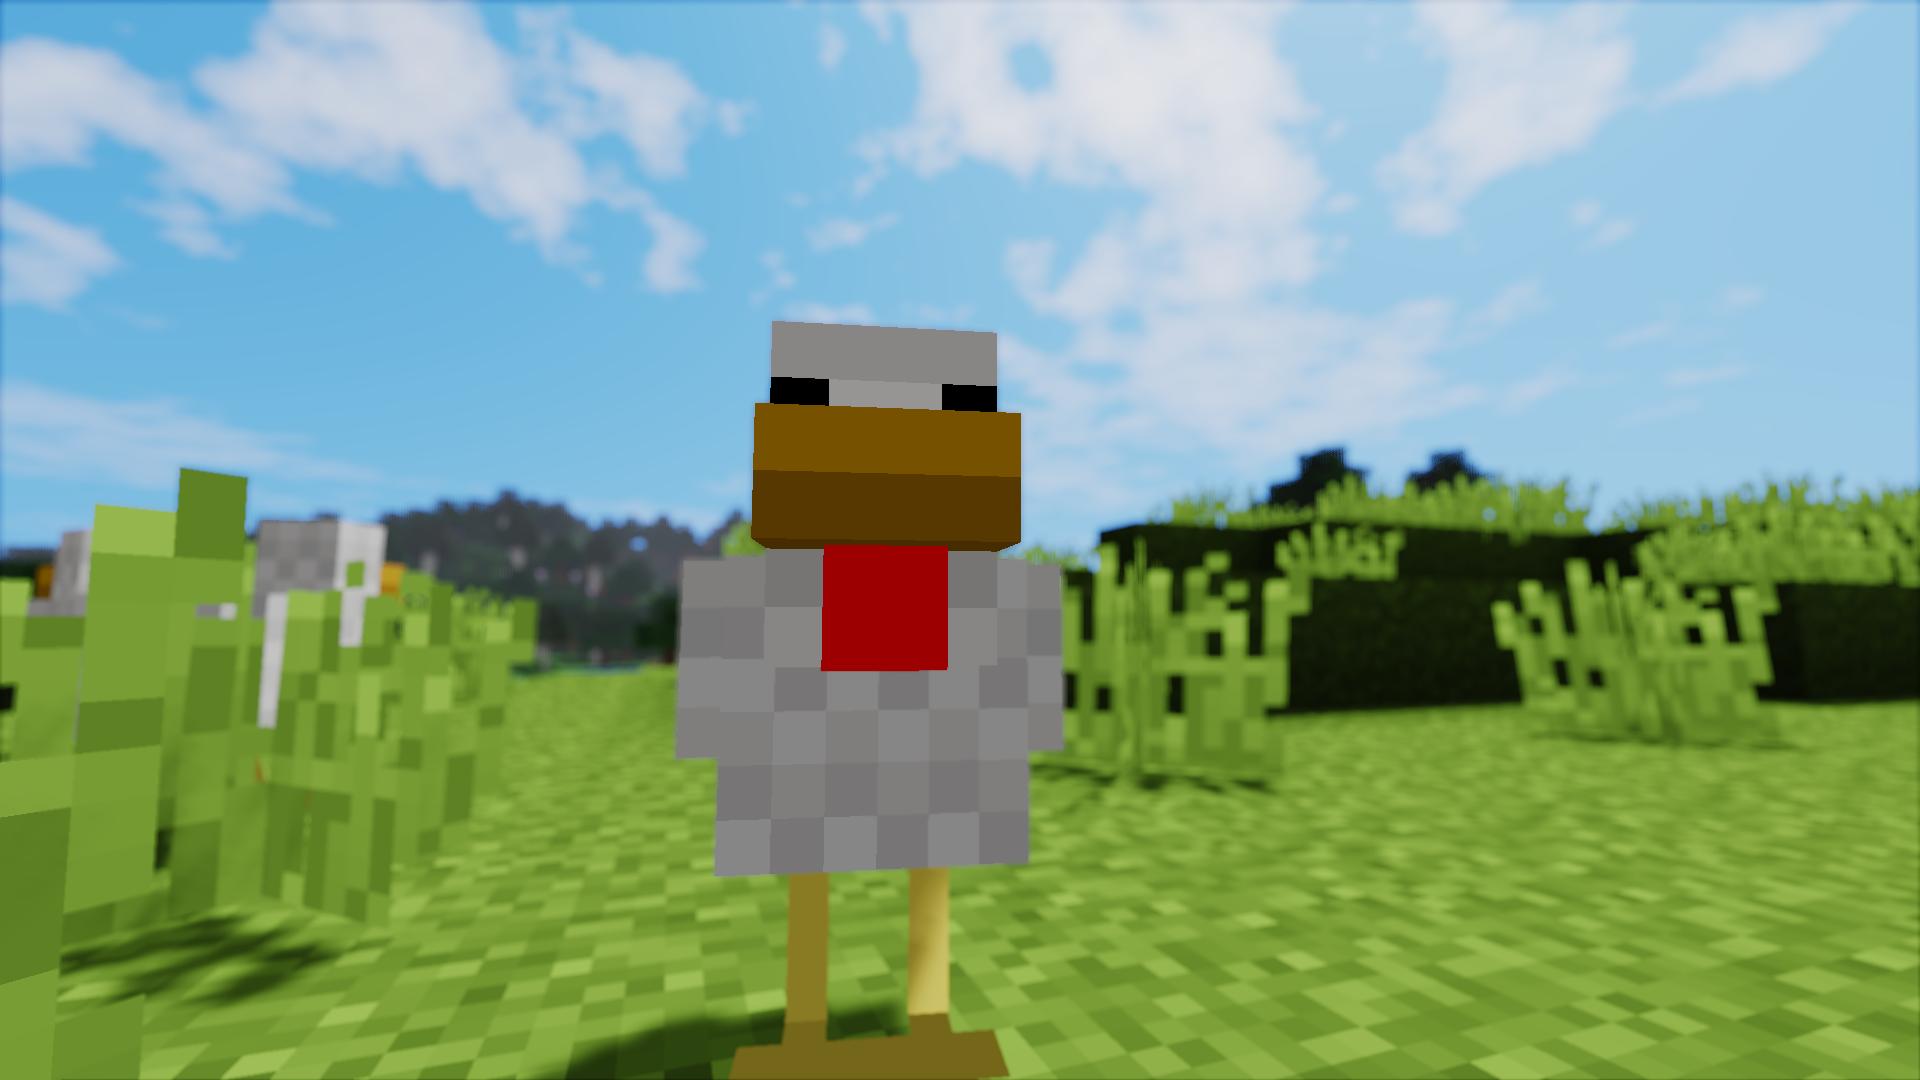 Minecraft mod minecraft rre36 39 s shaders v7 medium - Poule minecraft ...